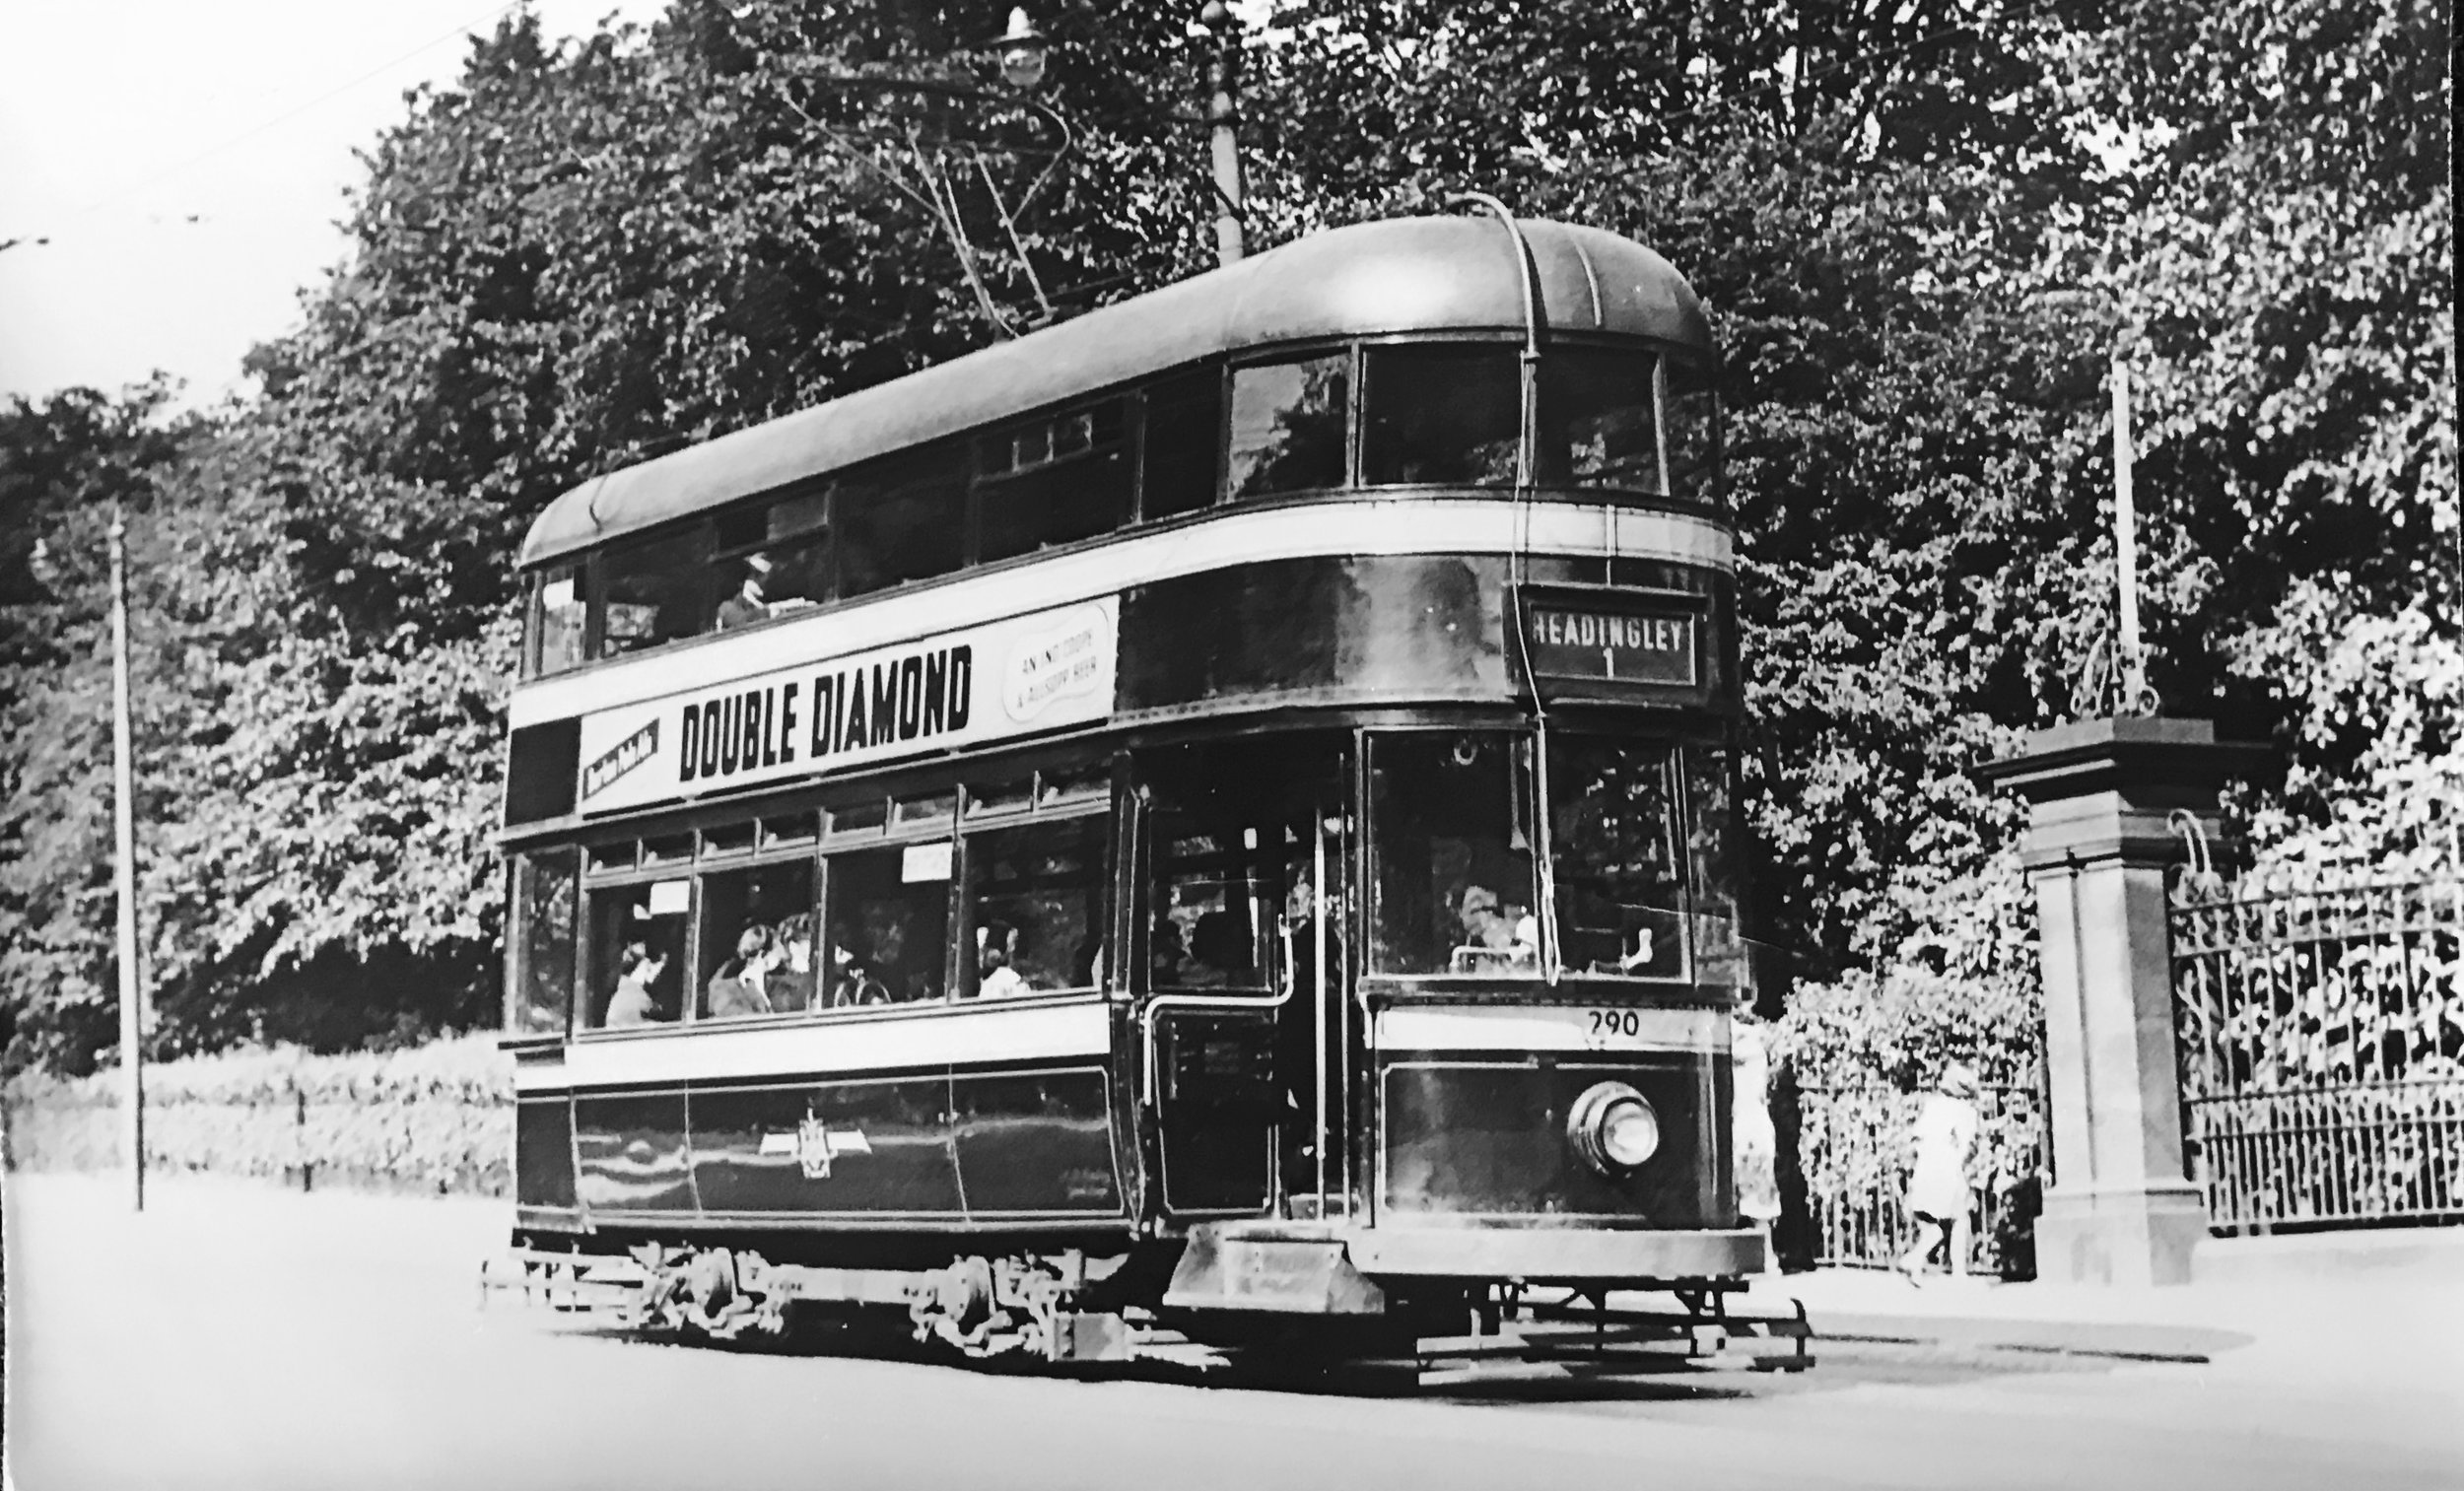 Tram, circa 1950